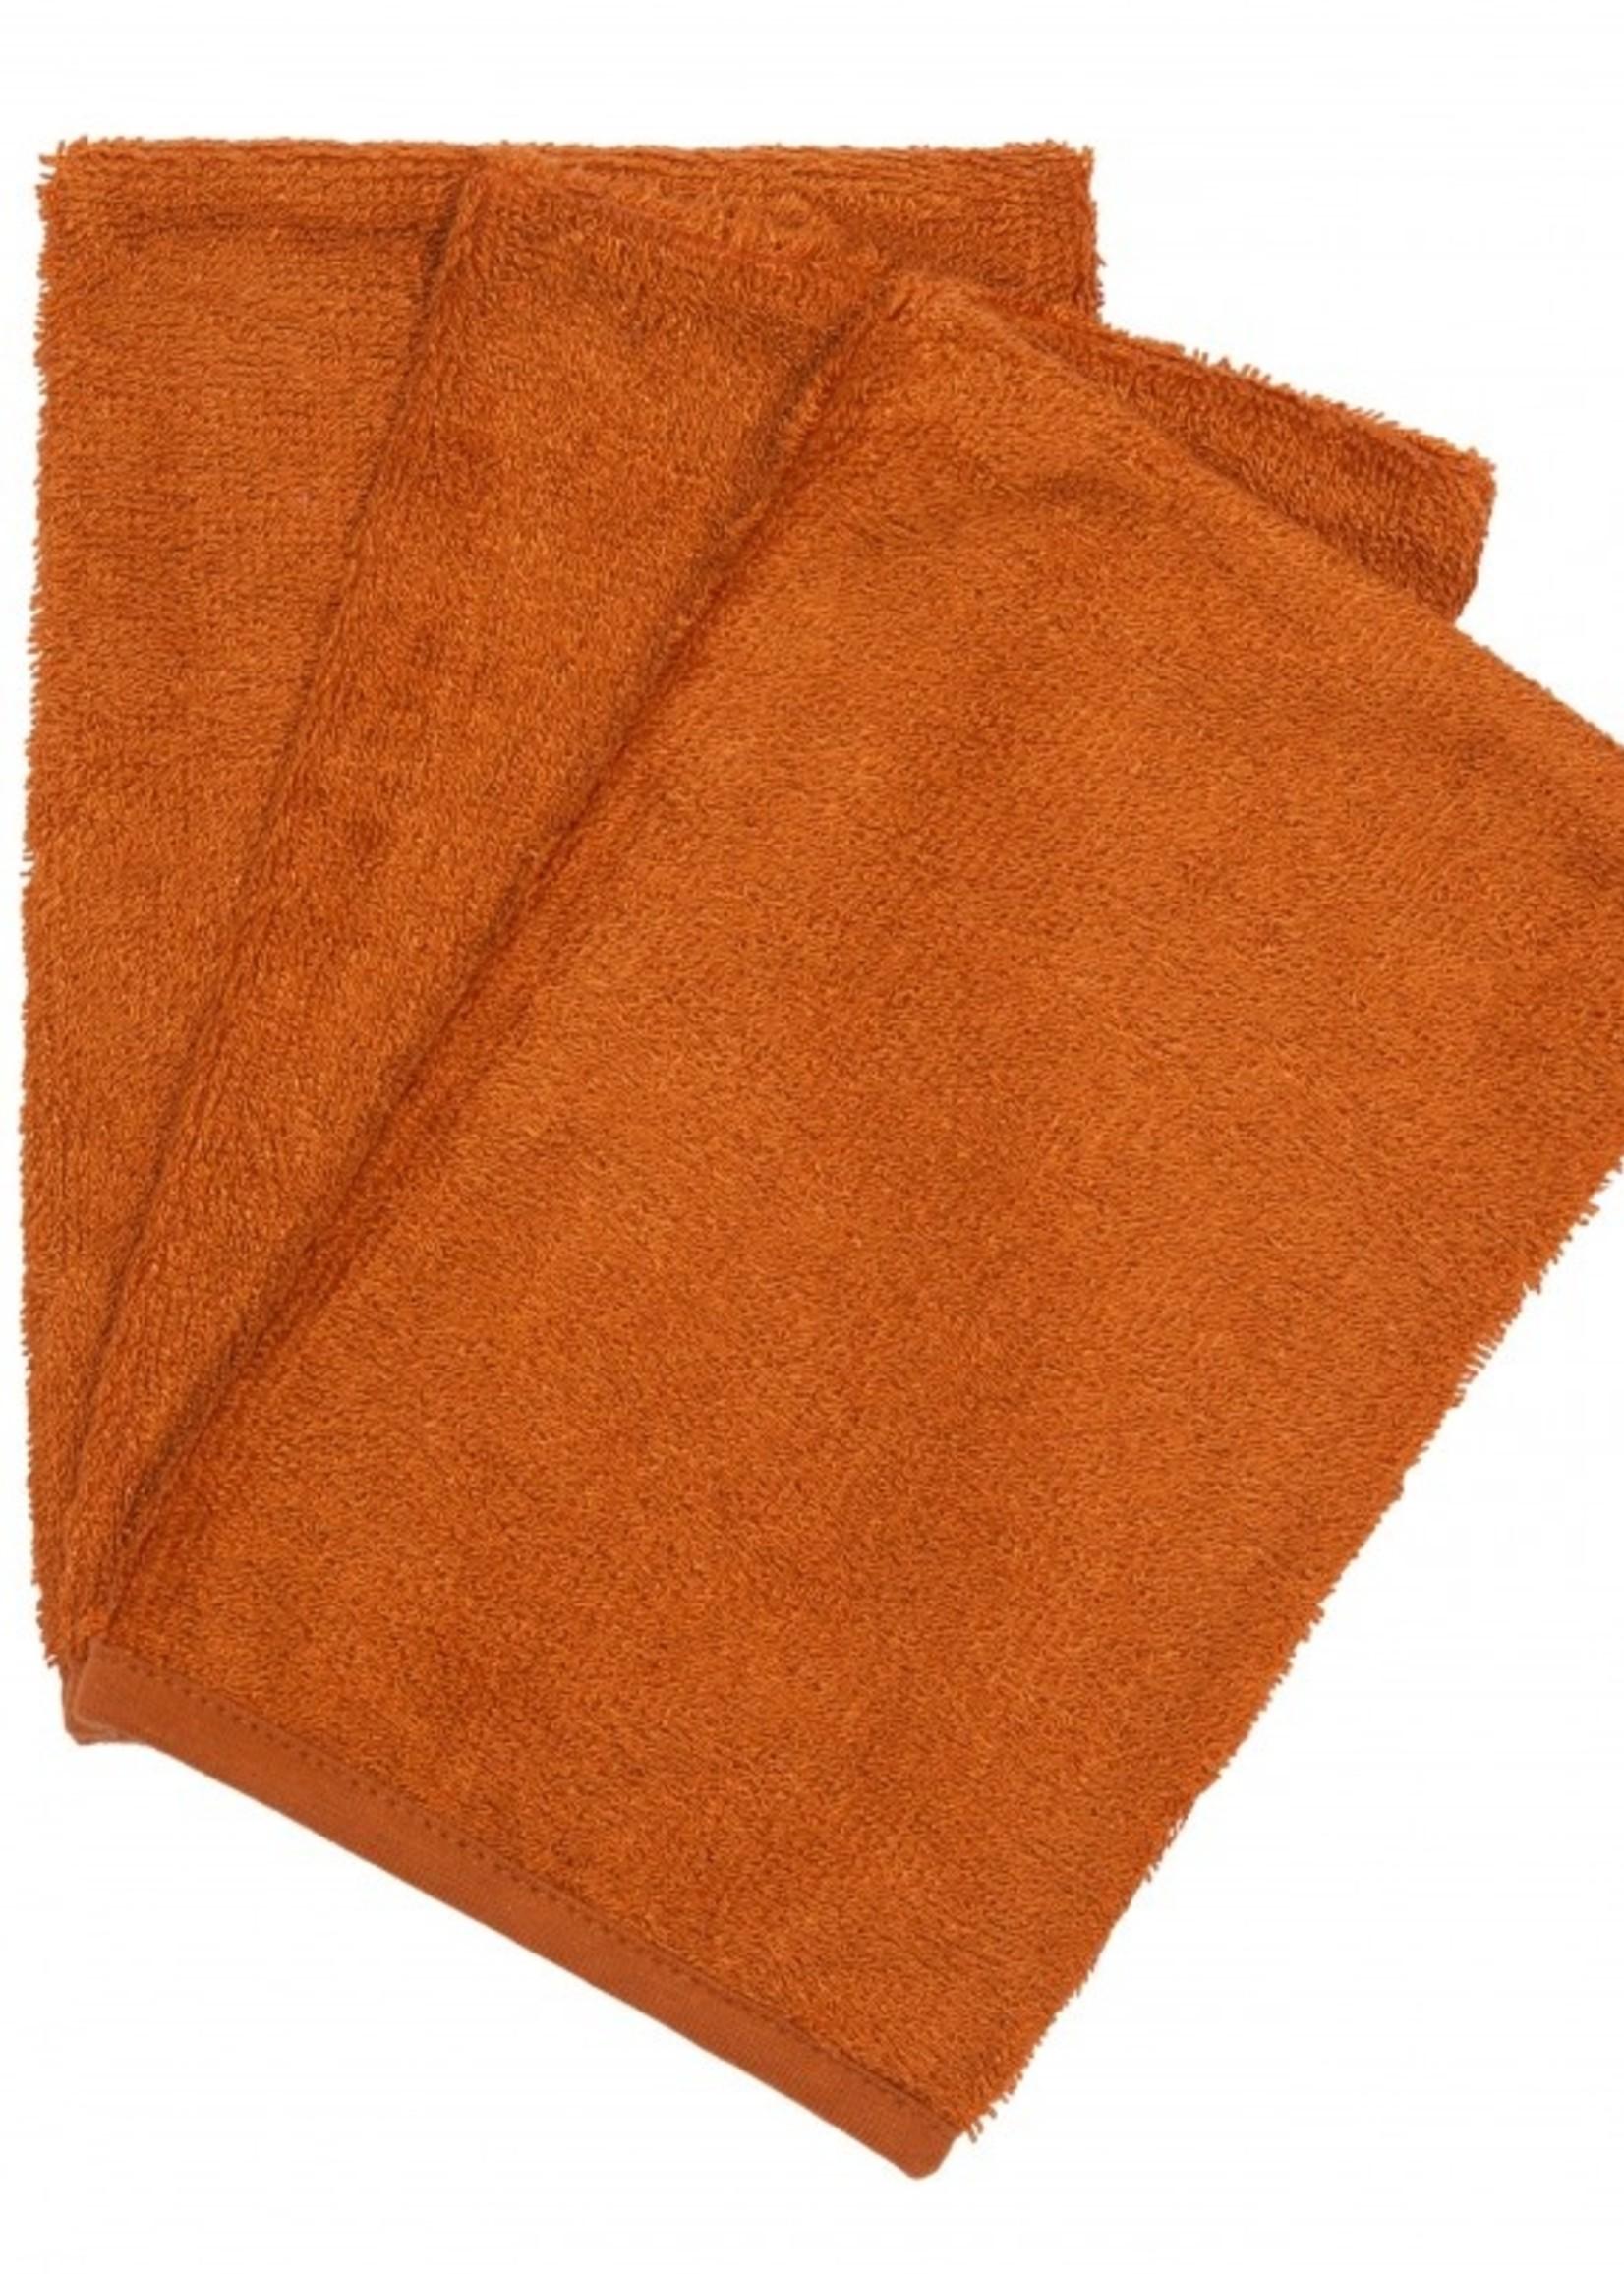 Timboo Set 3 Washcloths - Inca Rust